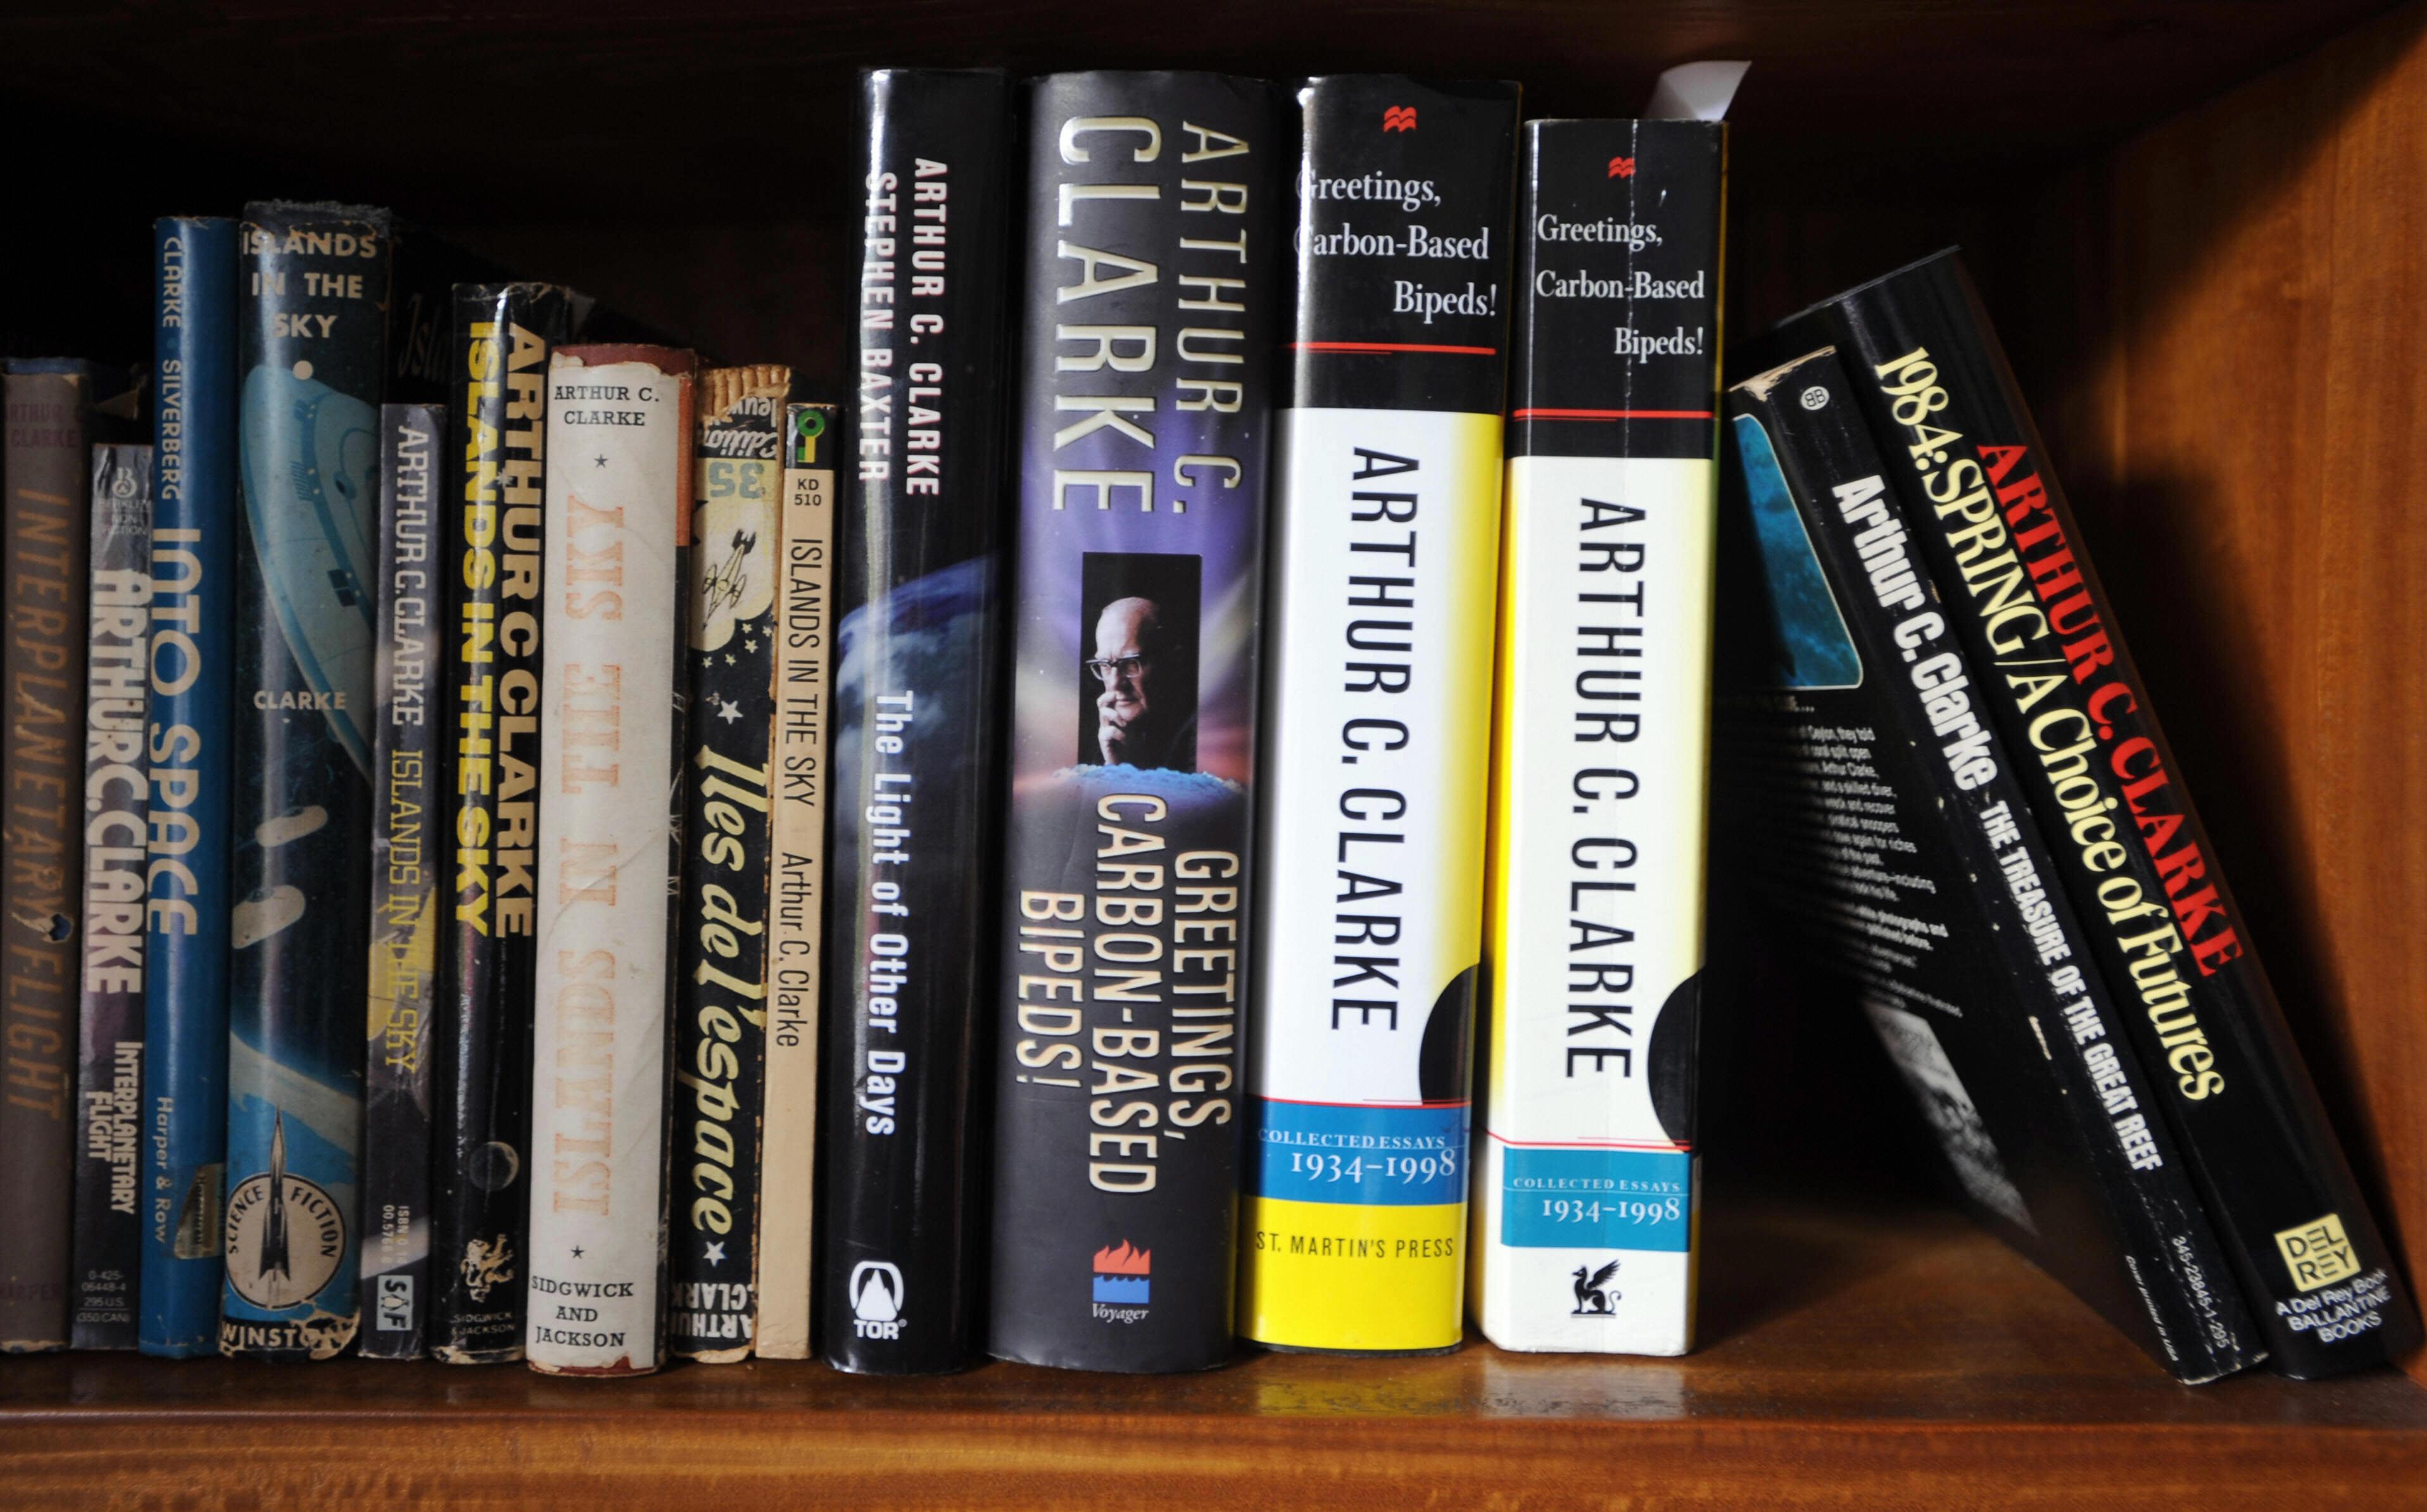 Books written by science fiction author Arthur C. Clarke